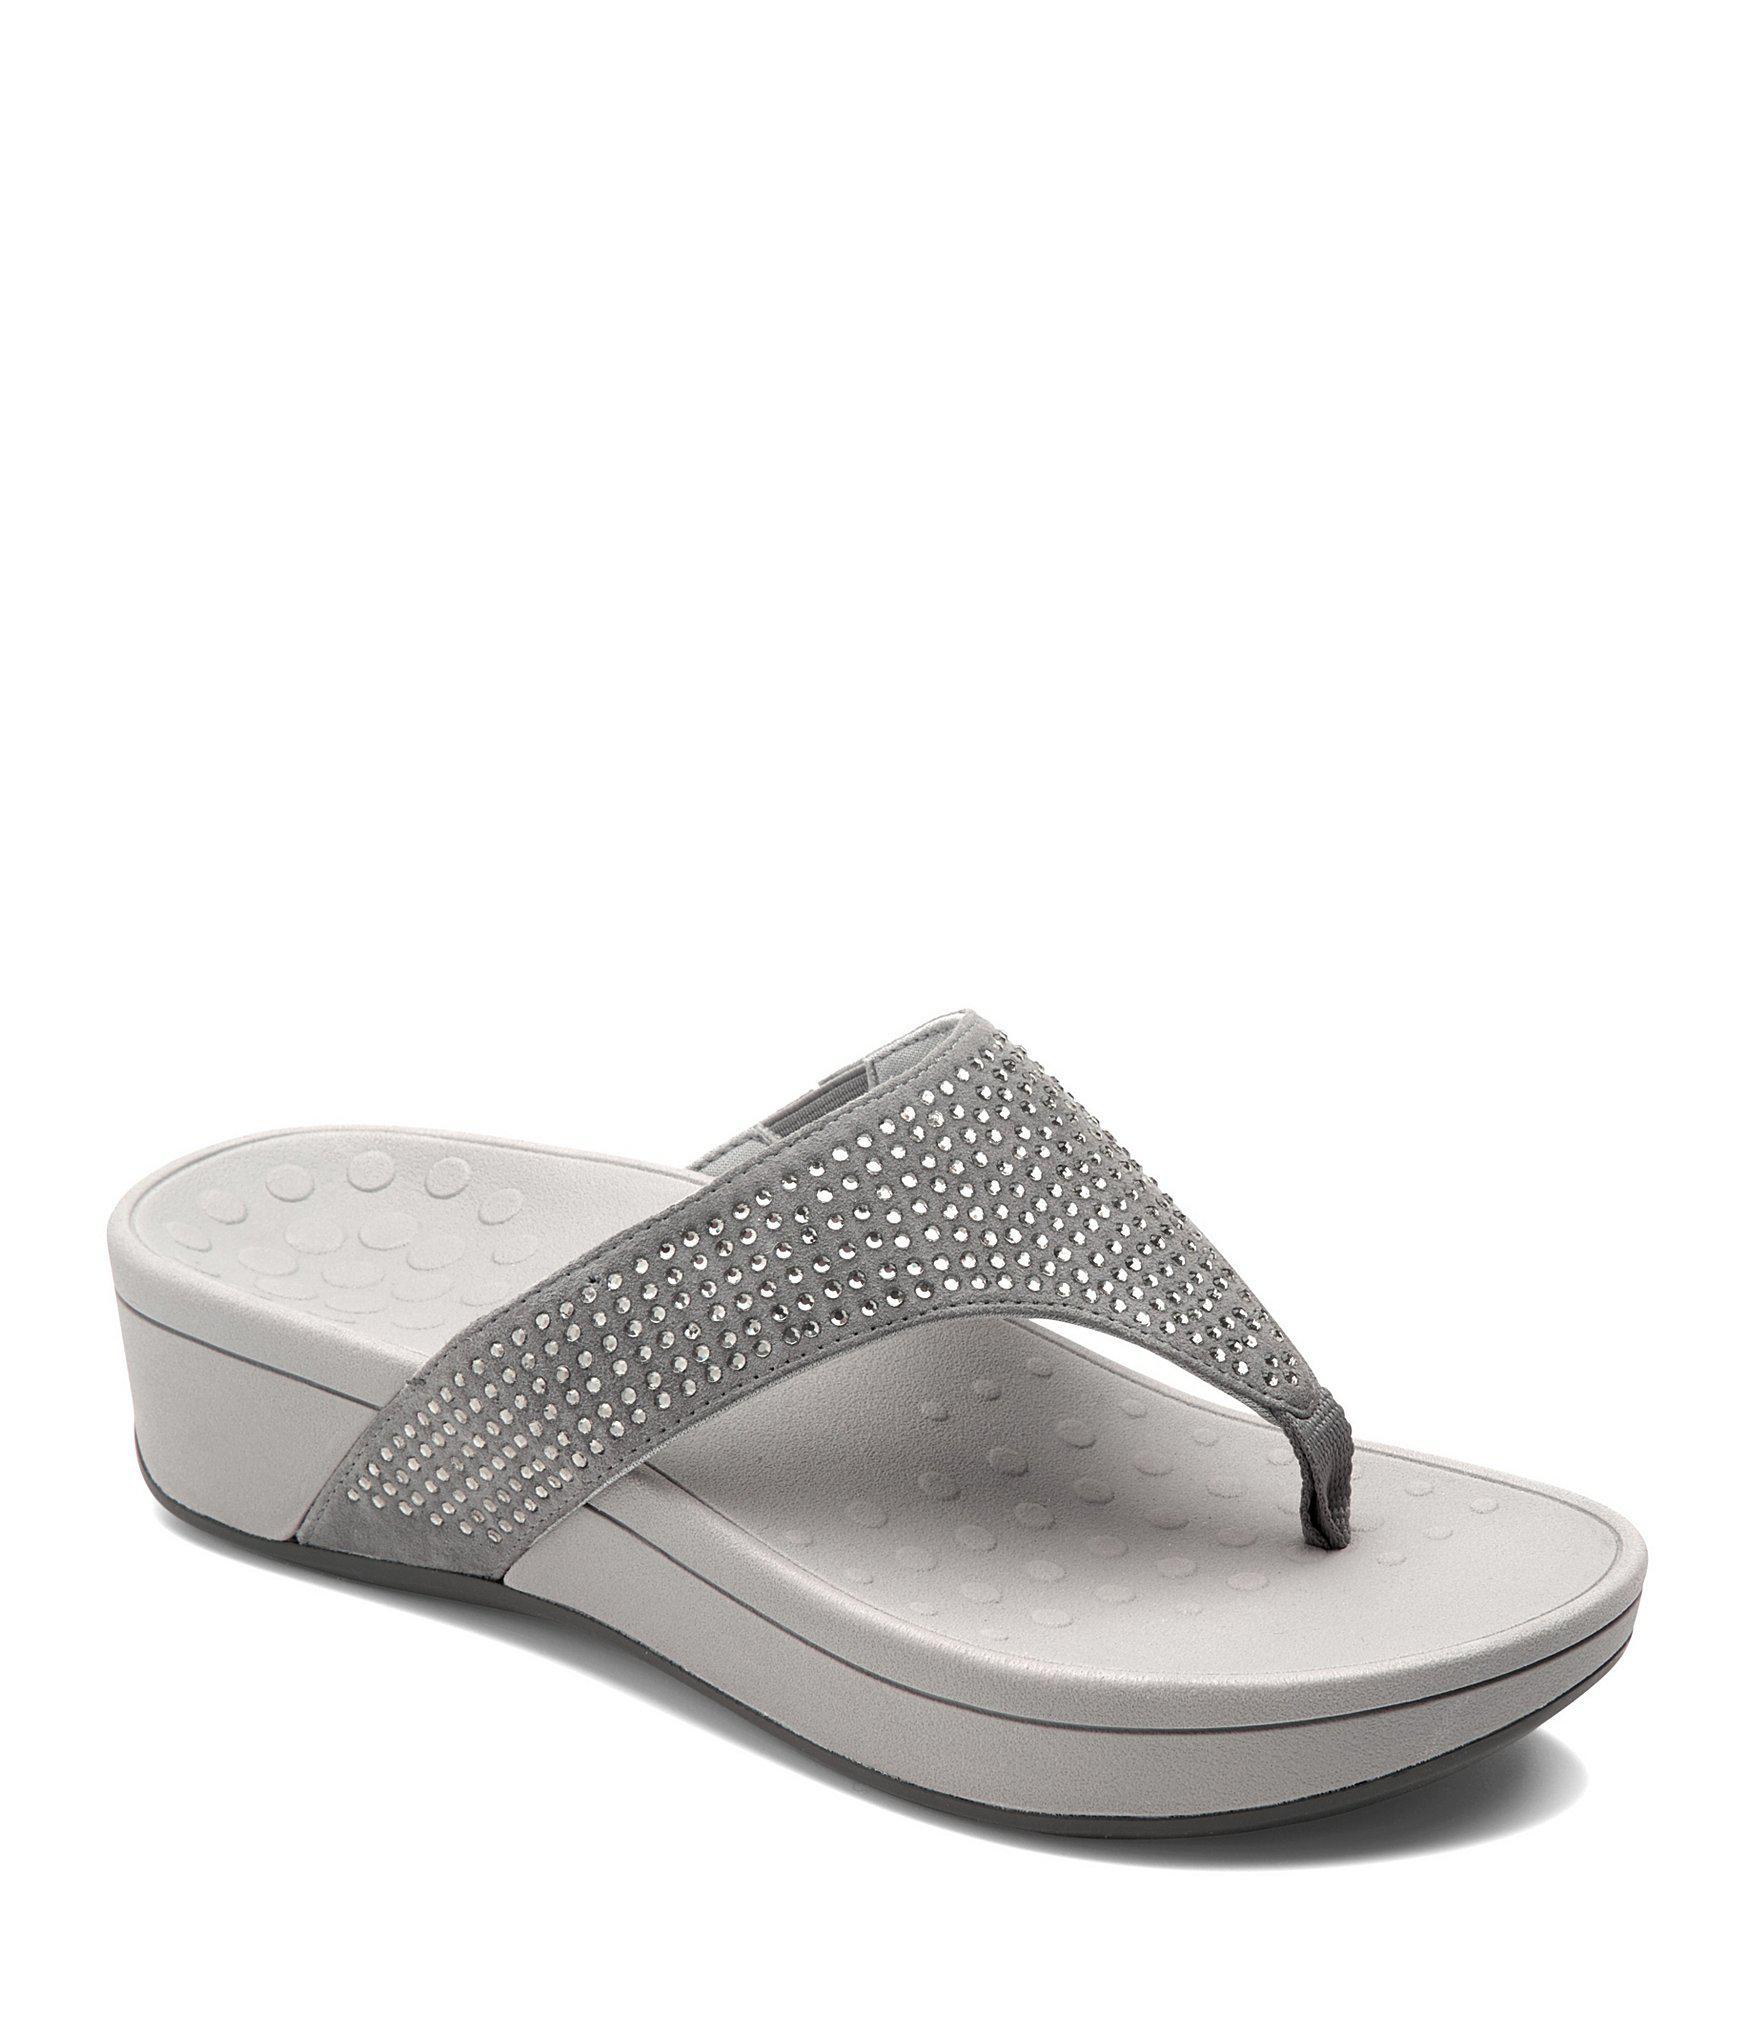 6410b04f8bb Vionic. Women s Naples Rhinestone Sparkle Wedge Thong Sandals